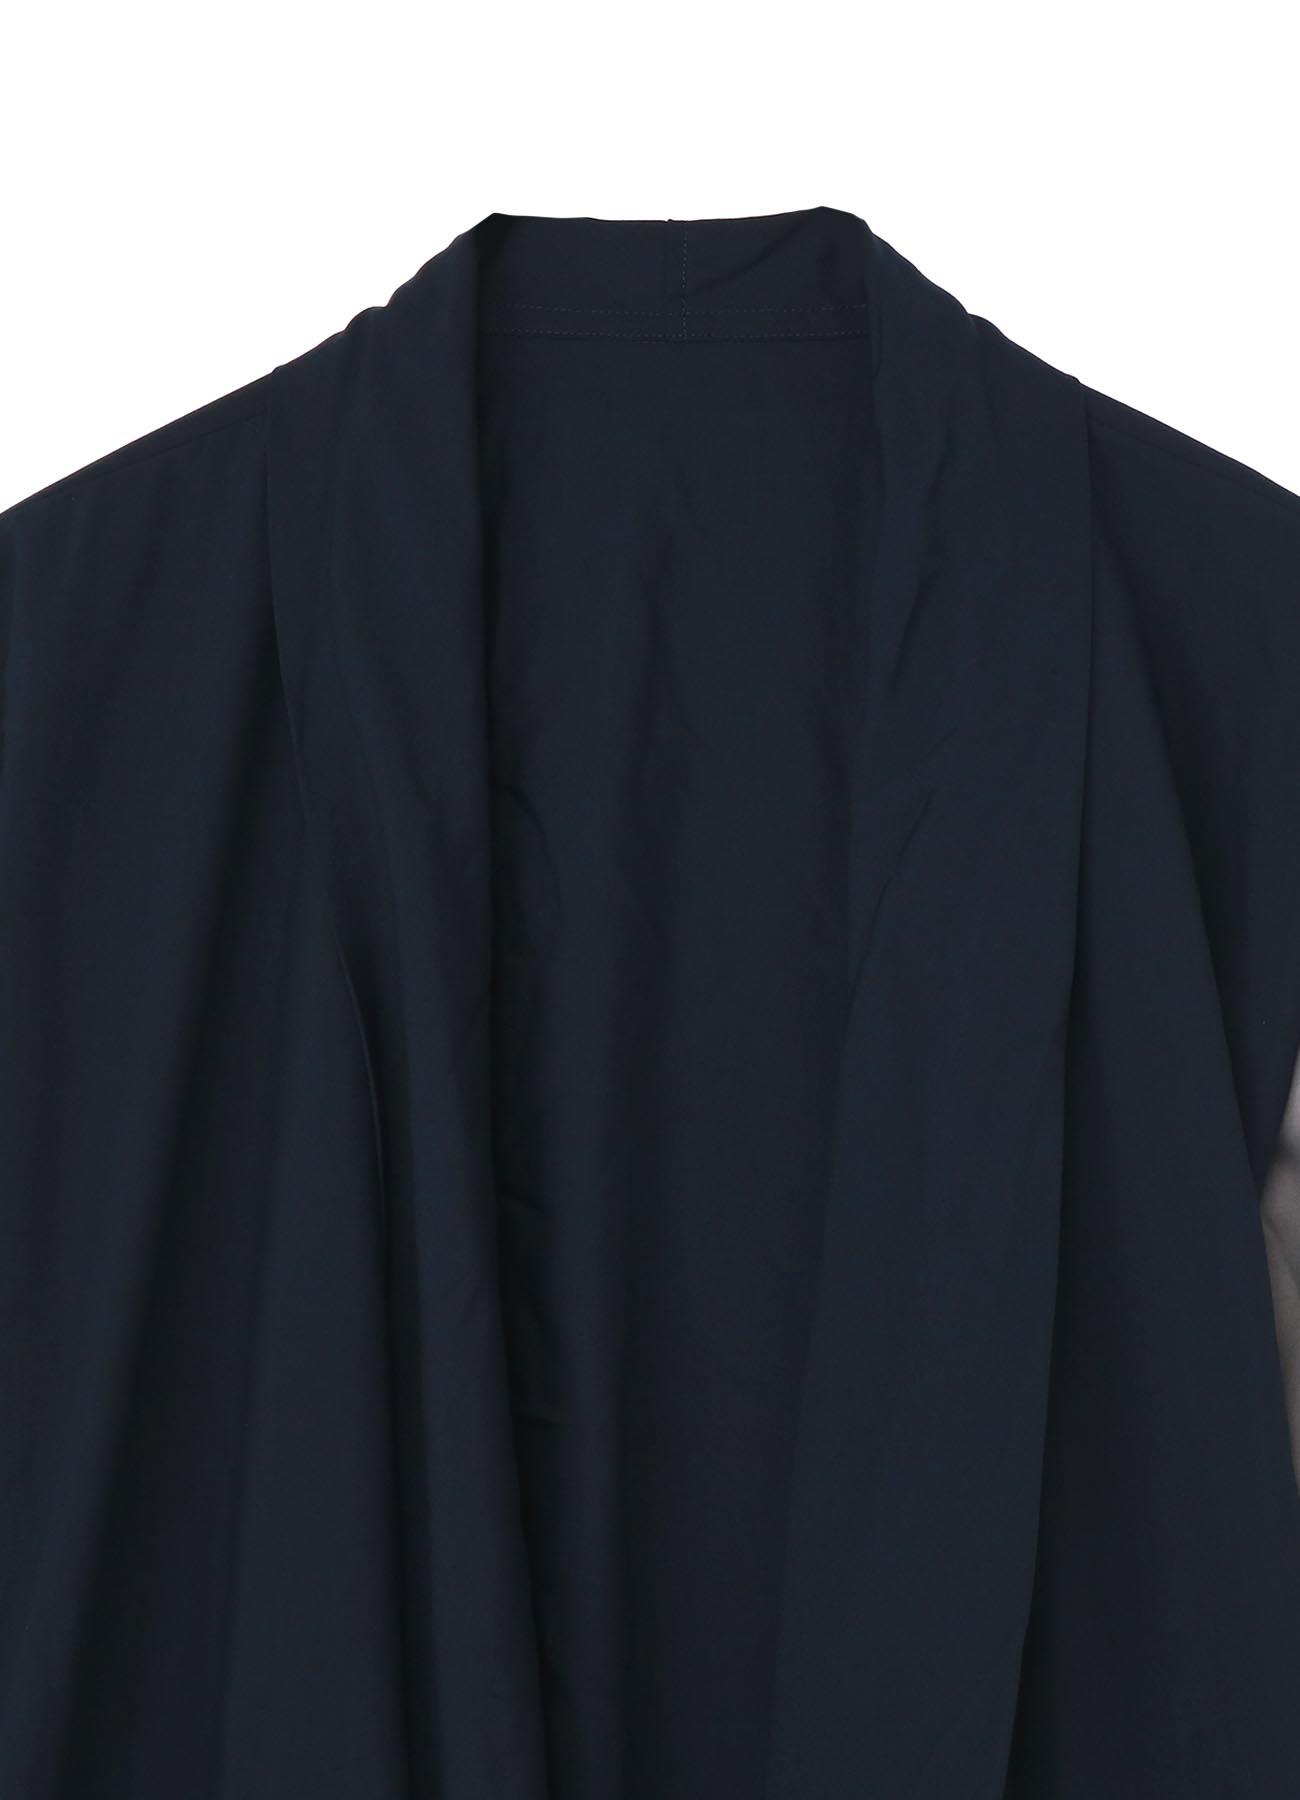 Garment Dye Drape Cardigan